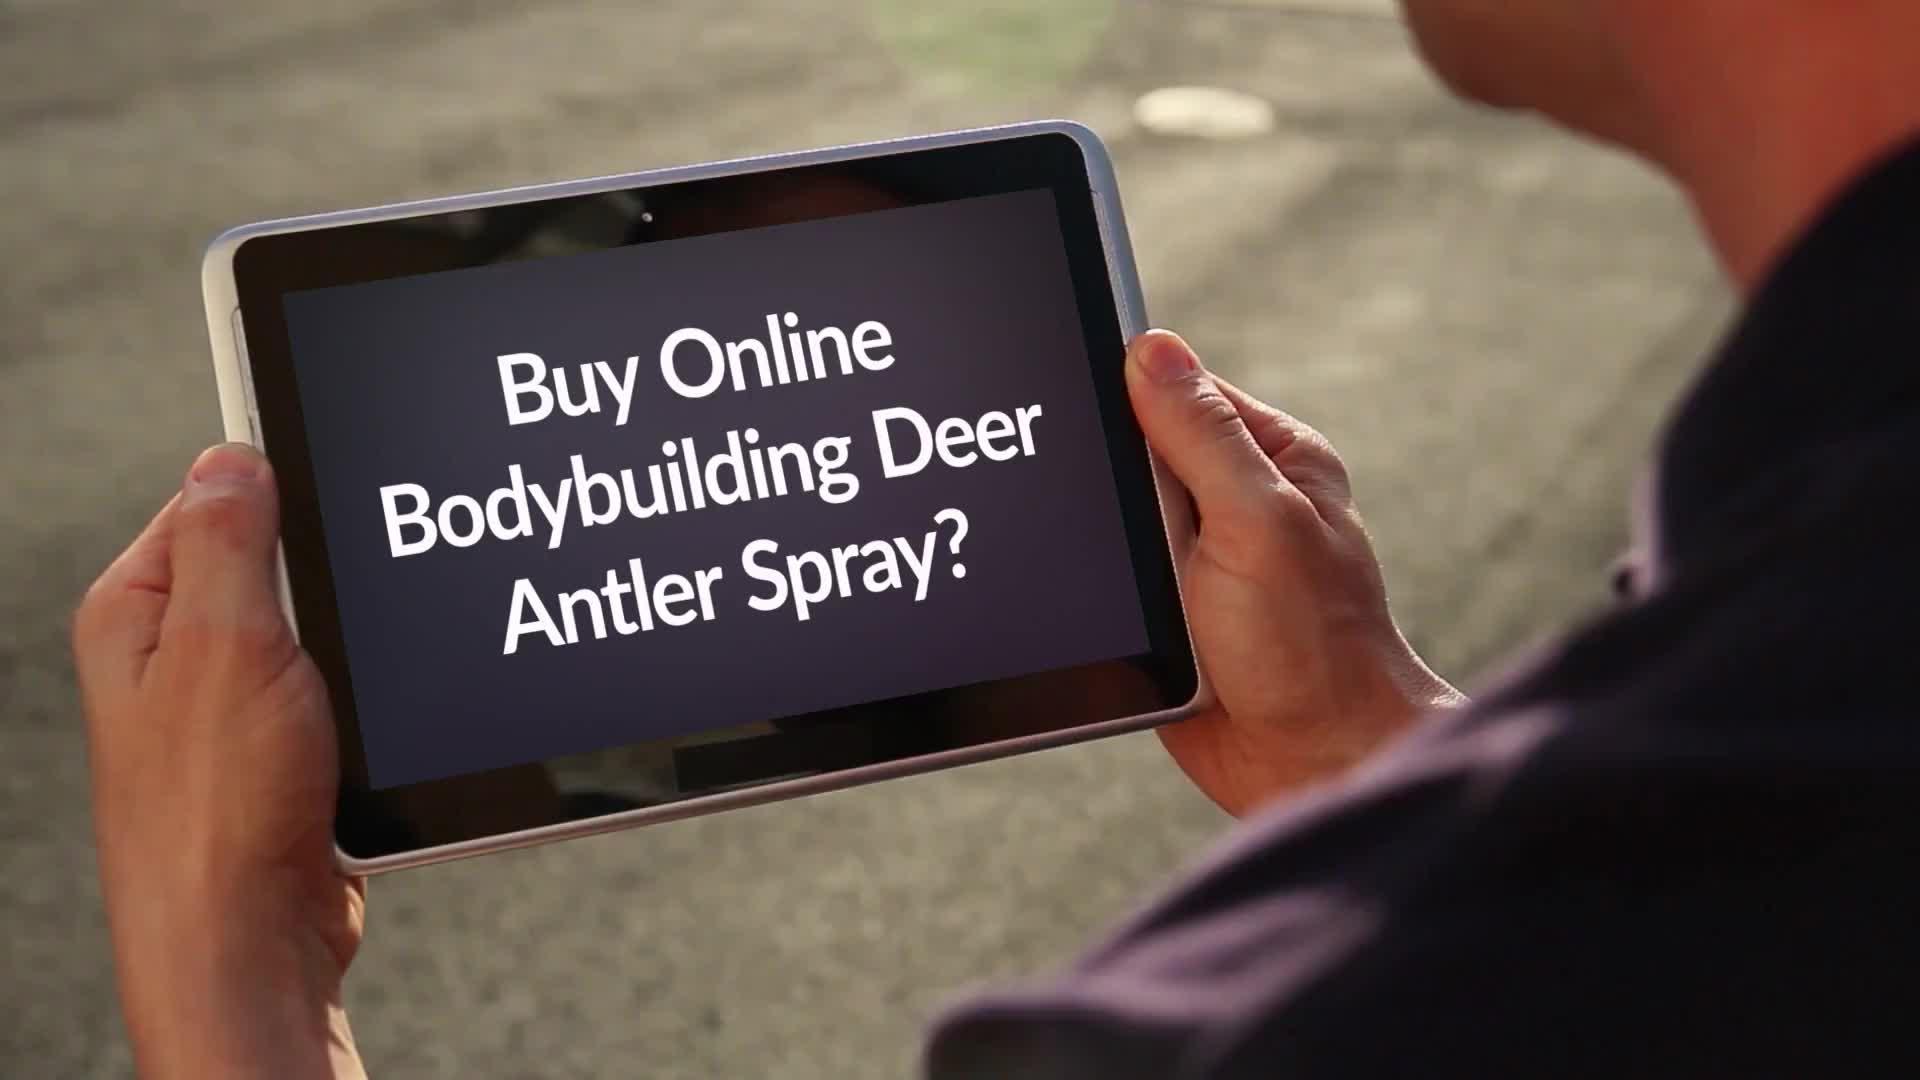 Nutronics Labs - Bodybuilding Deer Antler Spray GIFs